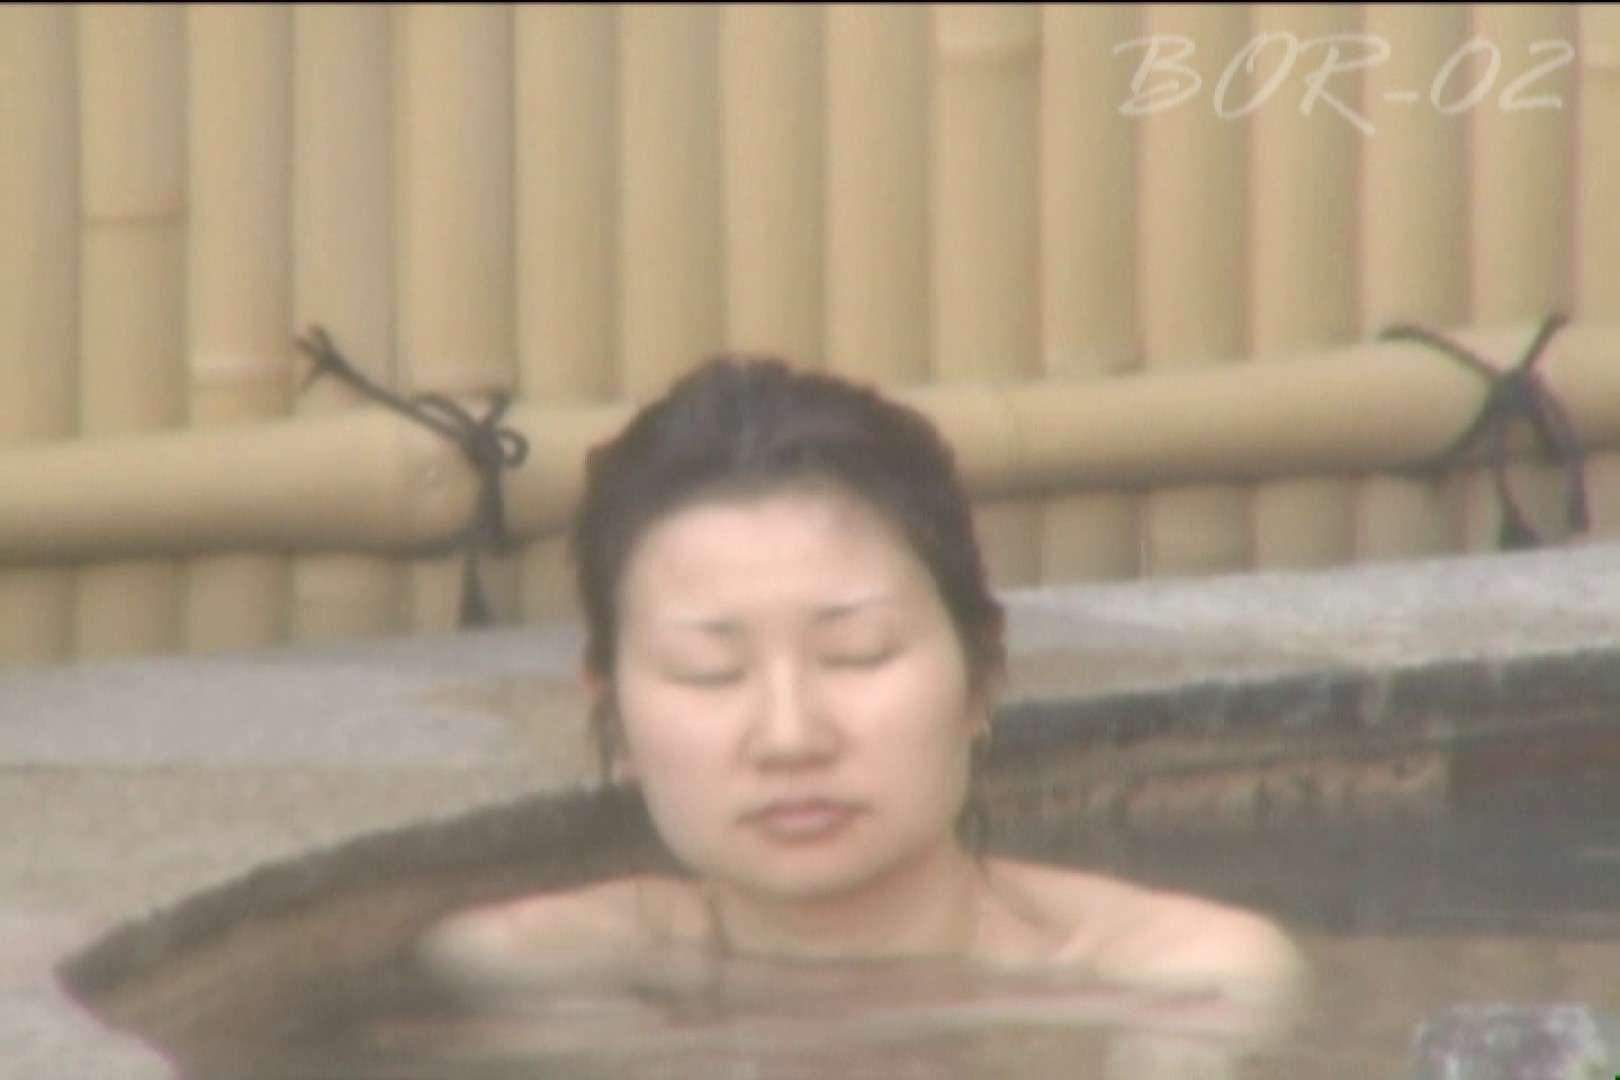 Aquaな露天風呂Vol.477 盗撮   OLエロ画像  99PICs 1